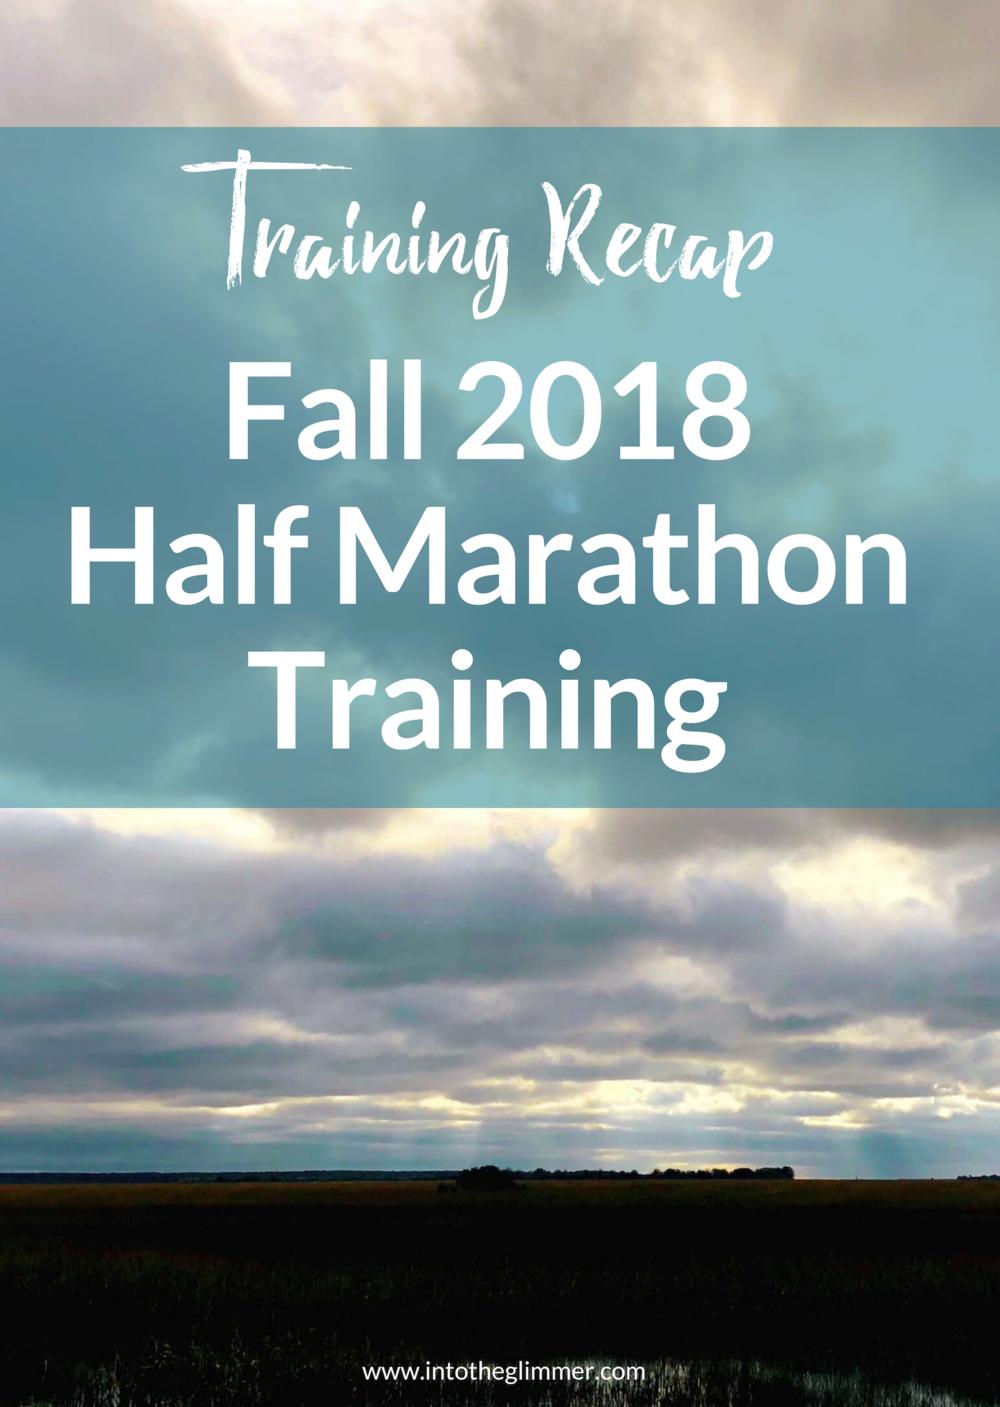 training recap wilmington historic half marathon into the glimmer